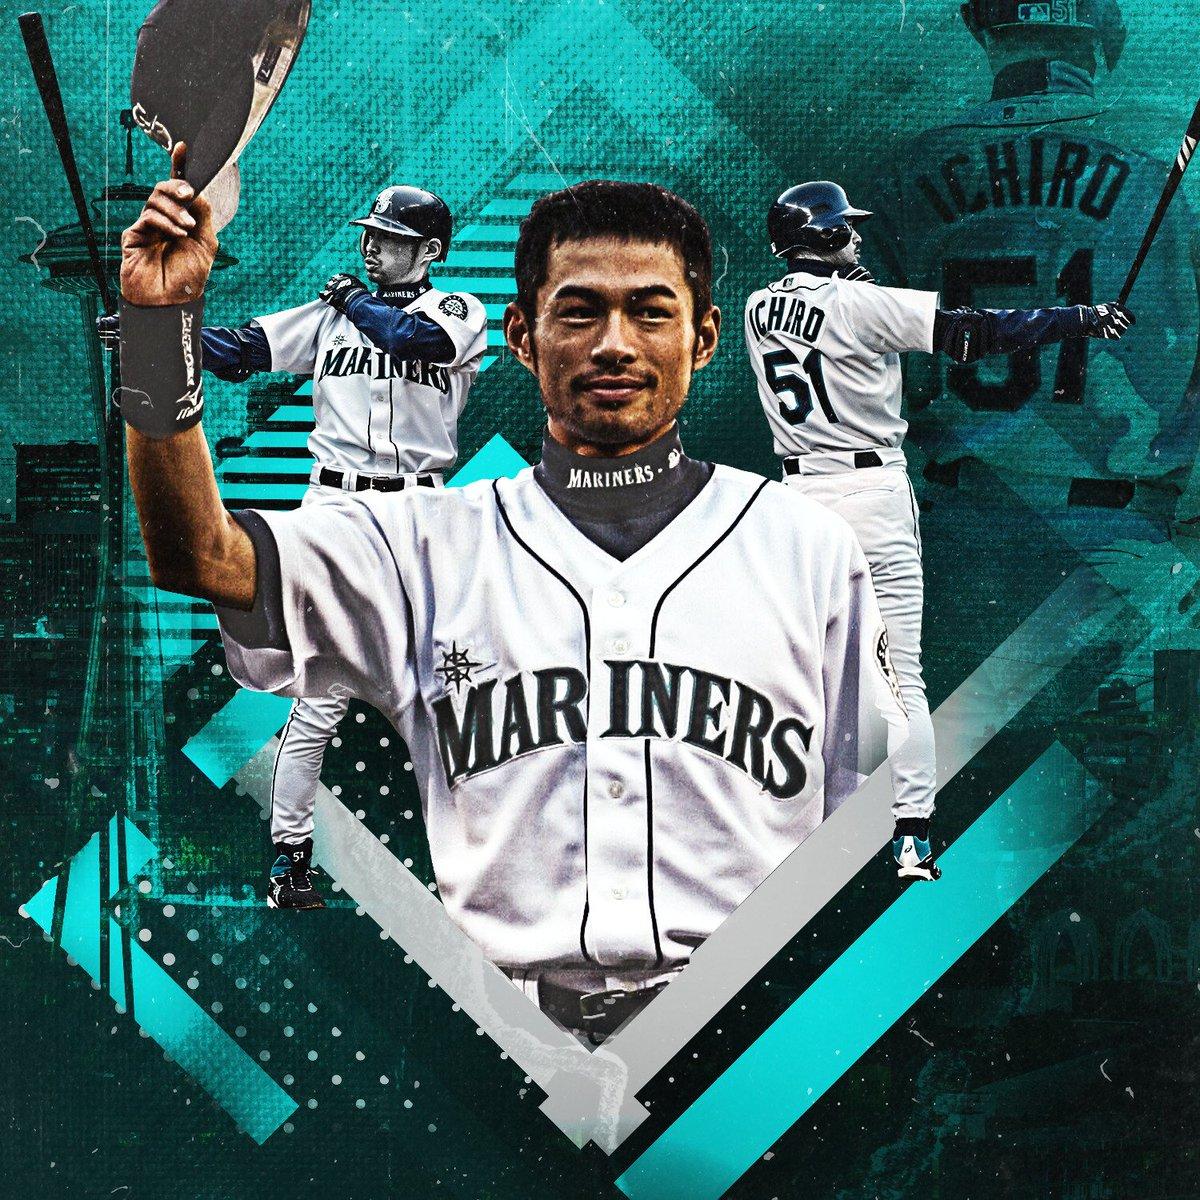 RT @MLB: Thank you, Ichiro.  Ichiro Suzuki will retire after a 19-year career in MLB. https://t.co/pOI3y8h1mF